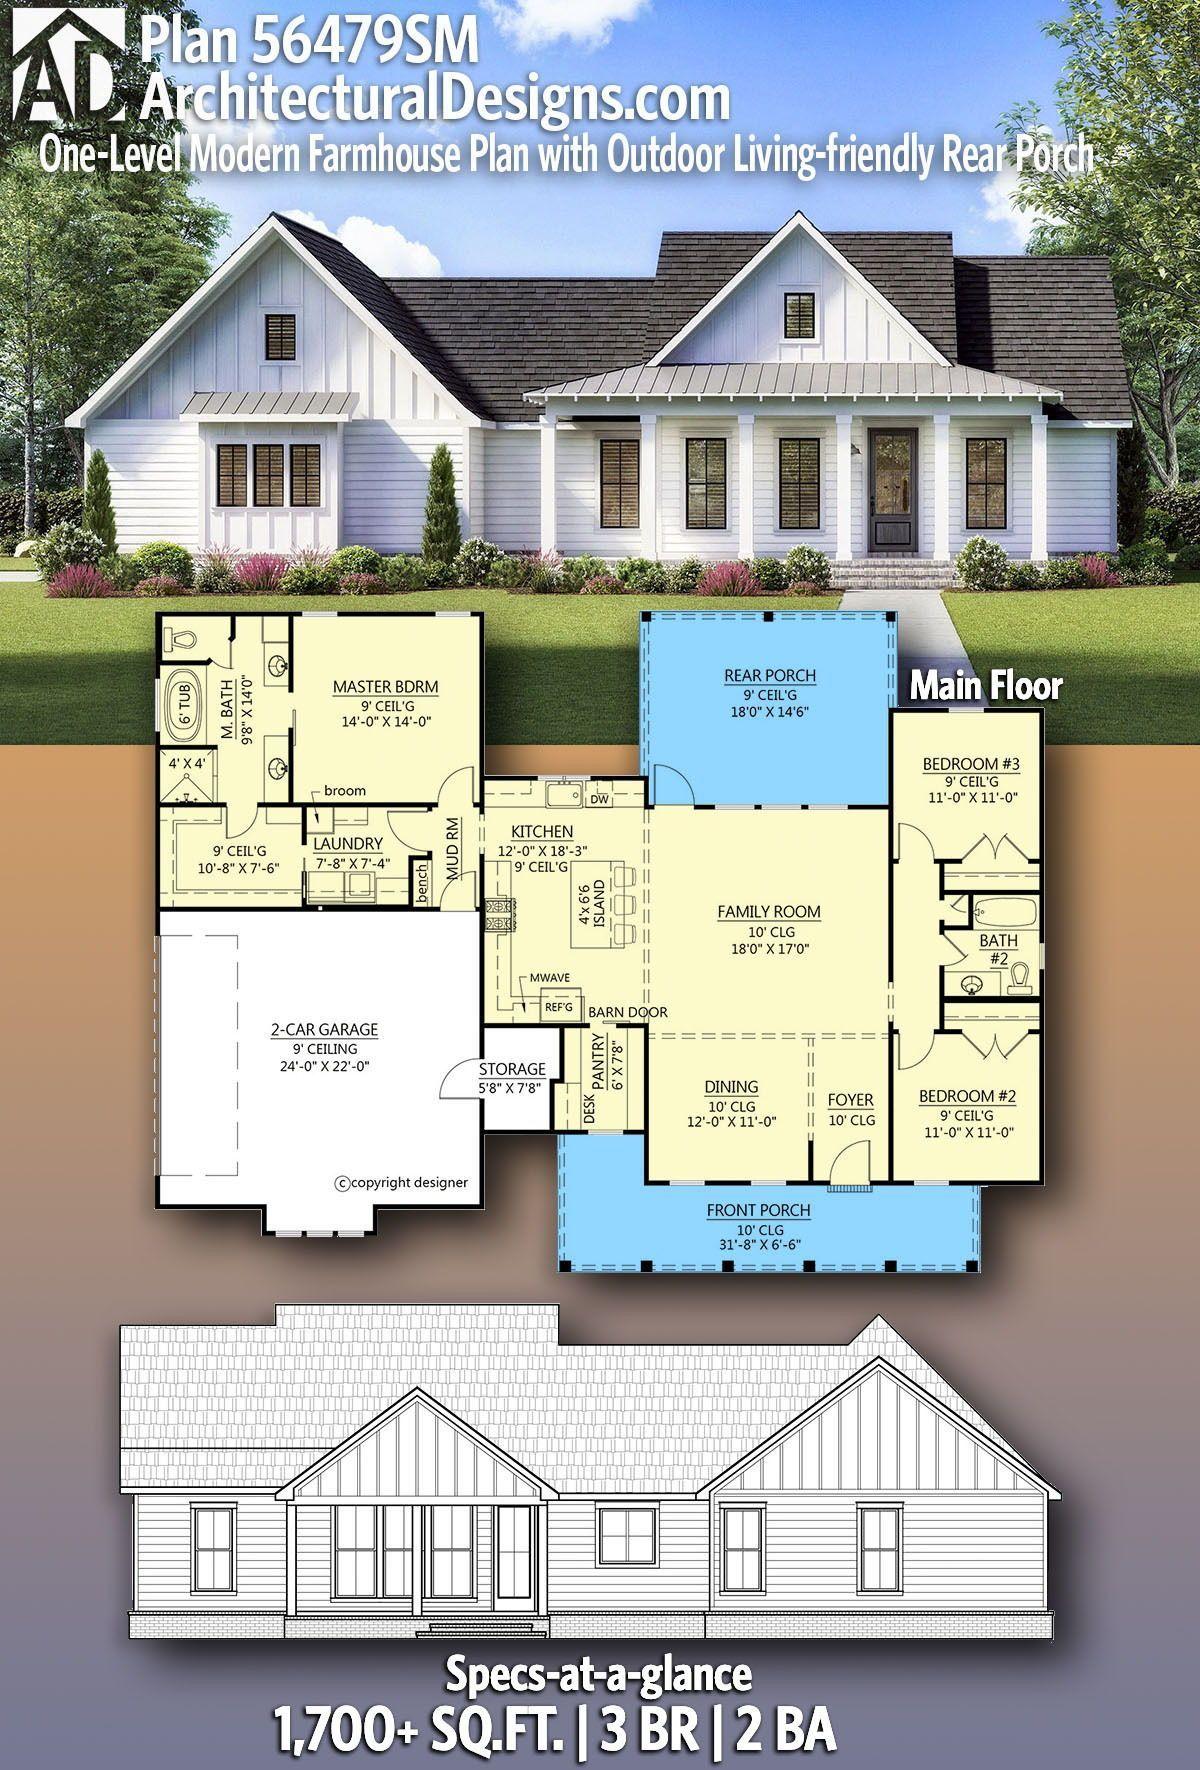 Plan 56479sm One Level Modern Farmhouse Plan With Outdoor Living Friendly Rear Porch Modern Farmhouse Plans Vacation House Plans New House Plans